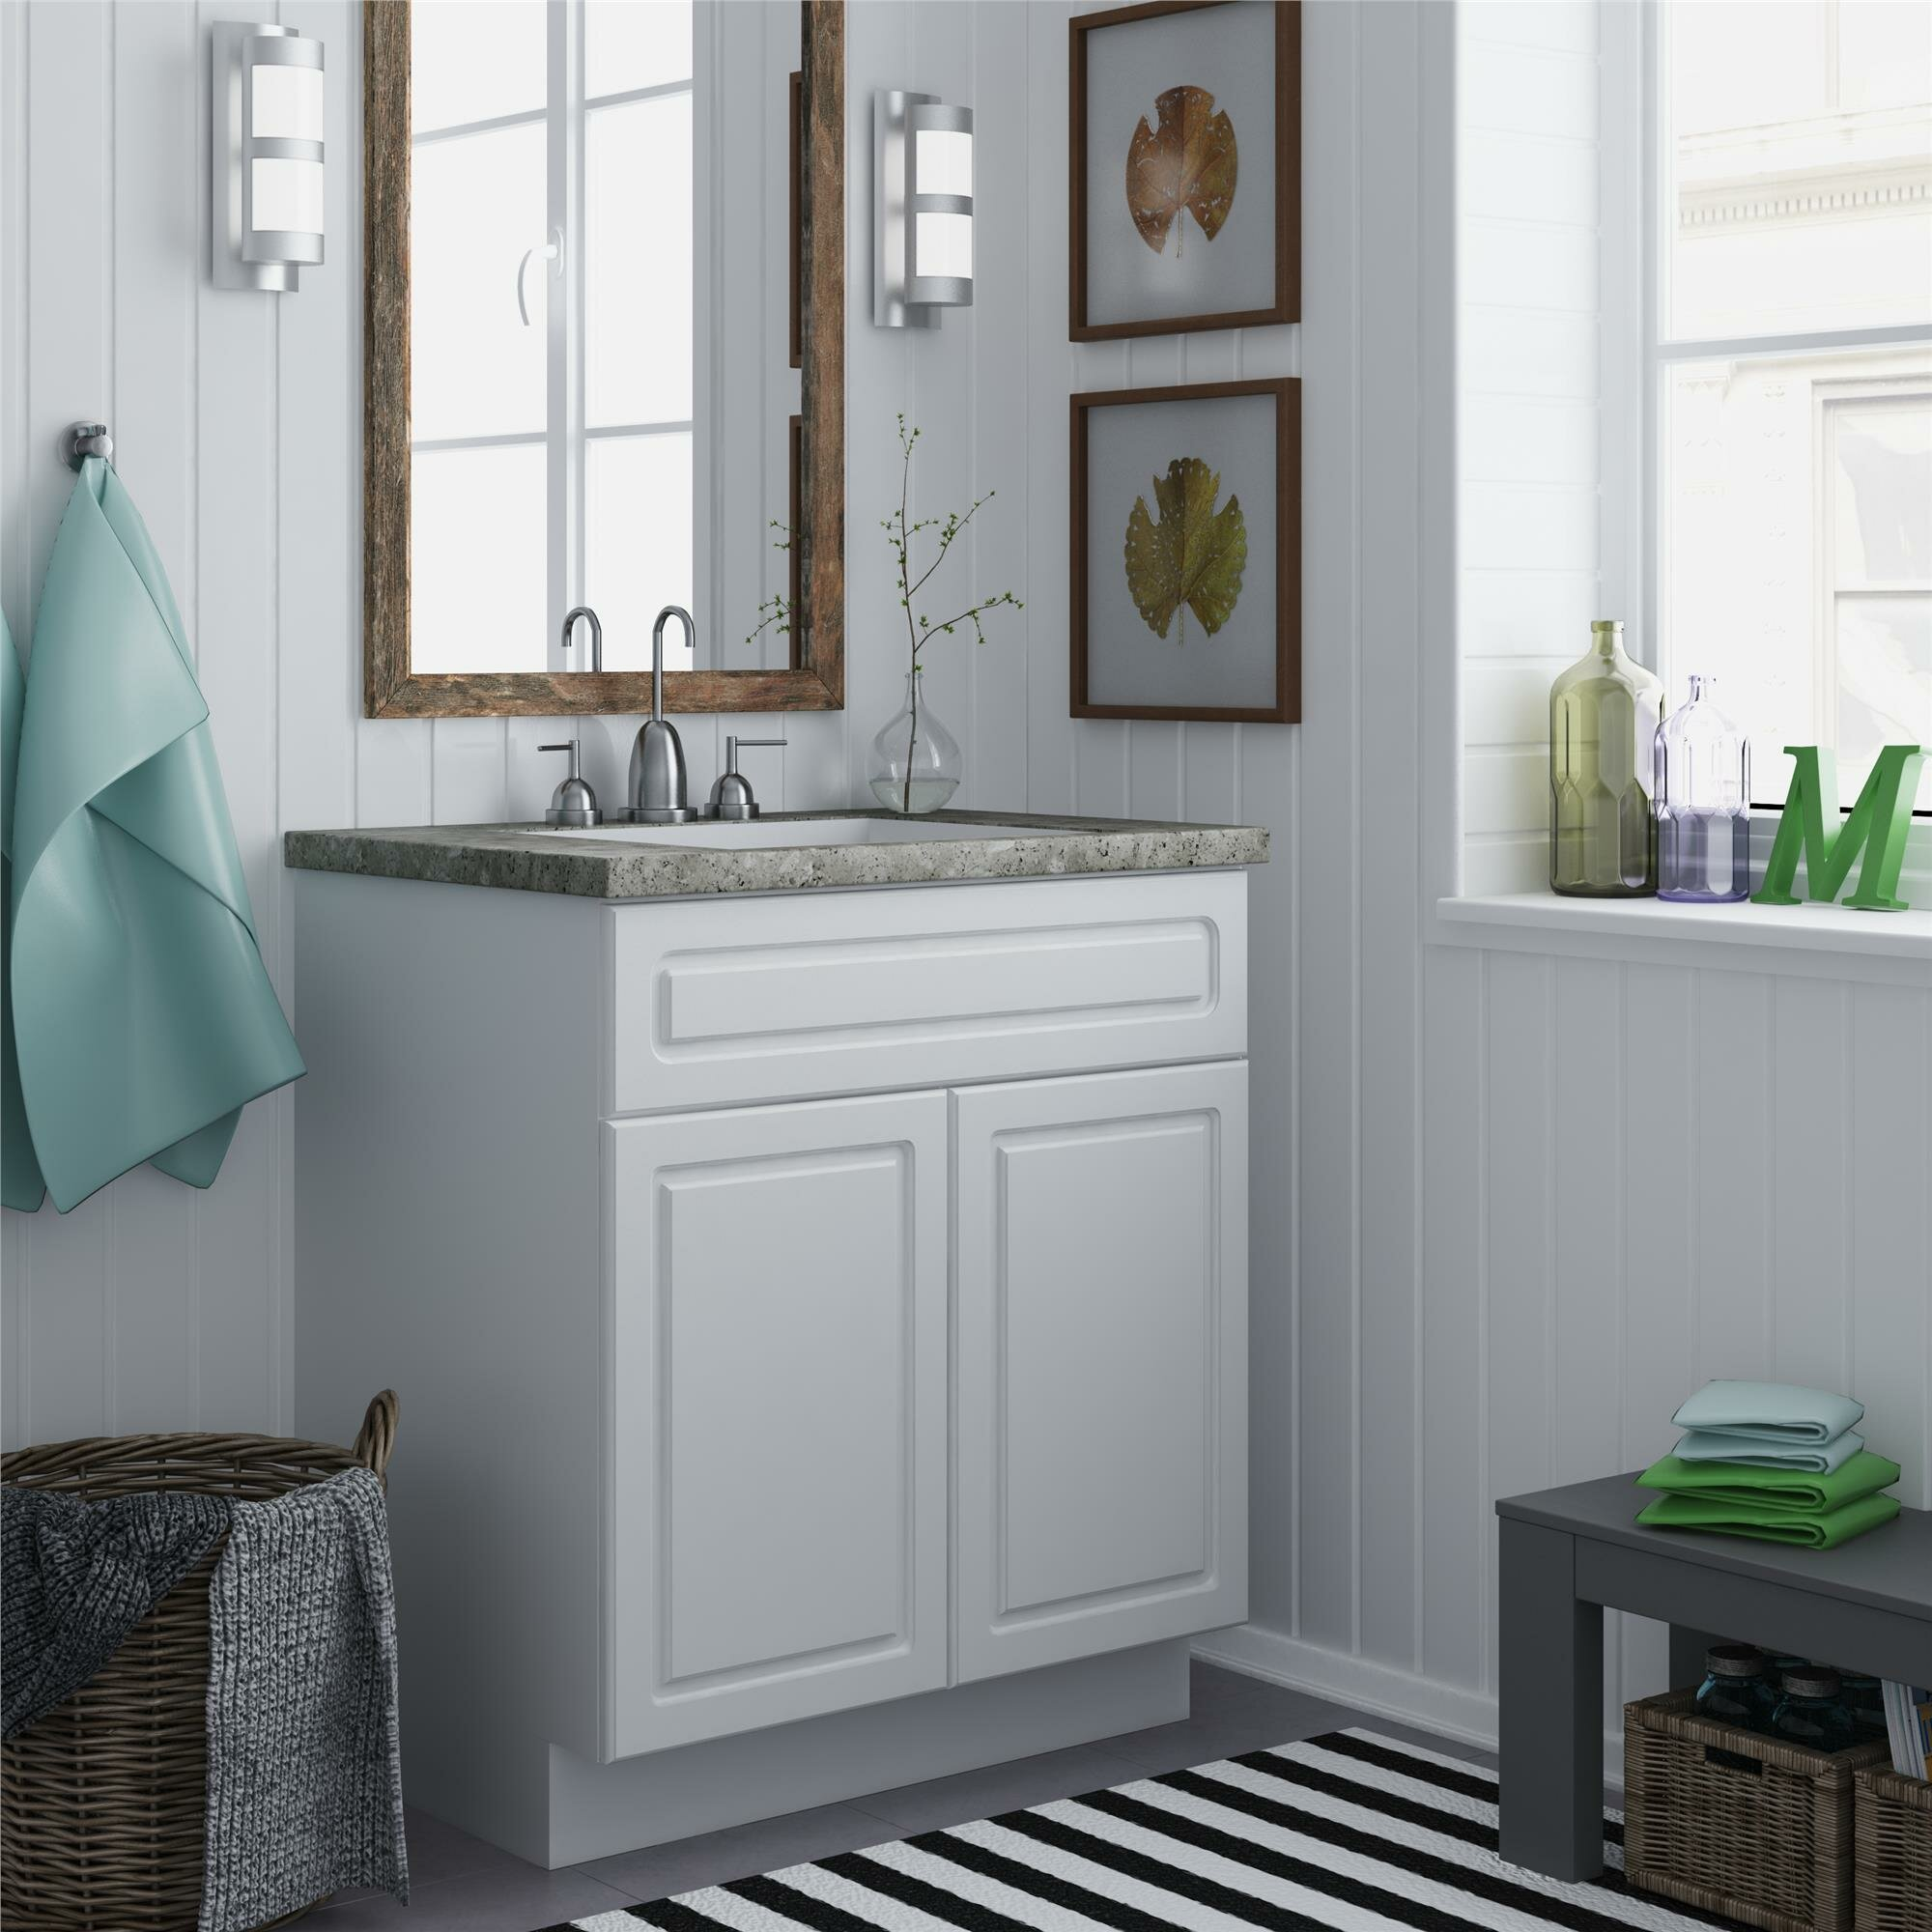 18 Inch Wide Bathroom Vanity Cabinet In Portland Deebonk